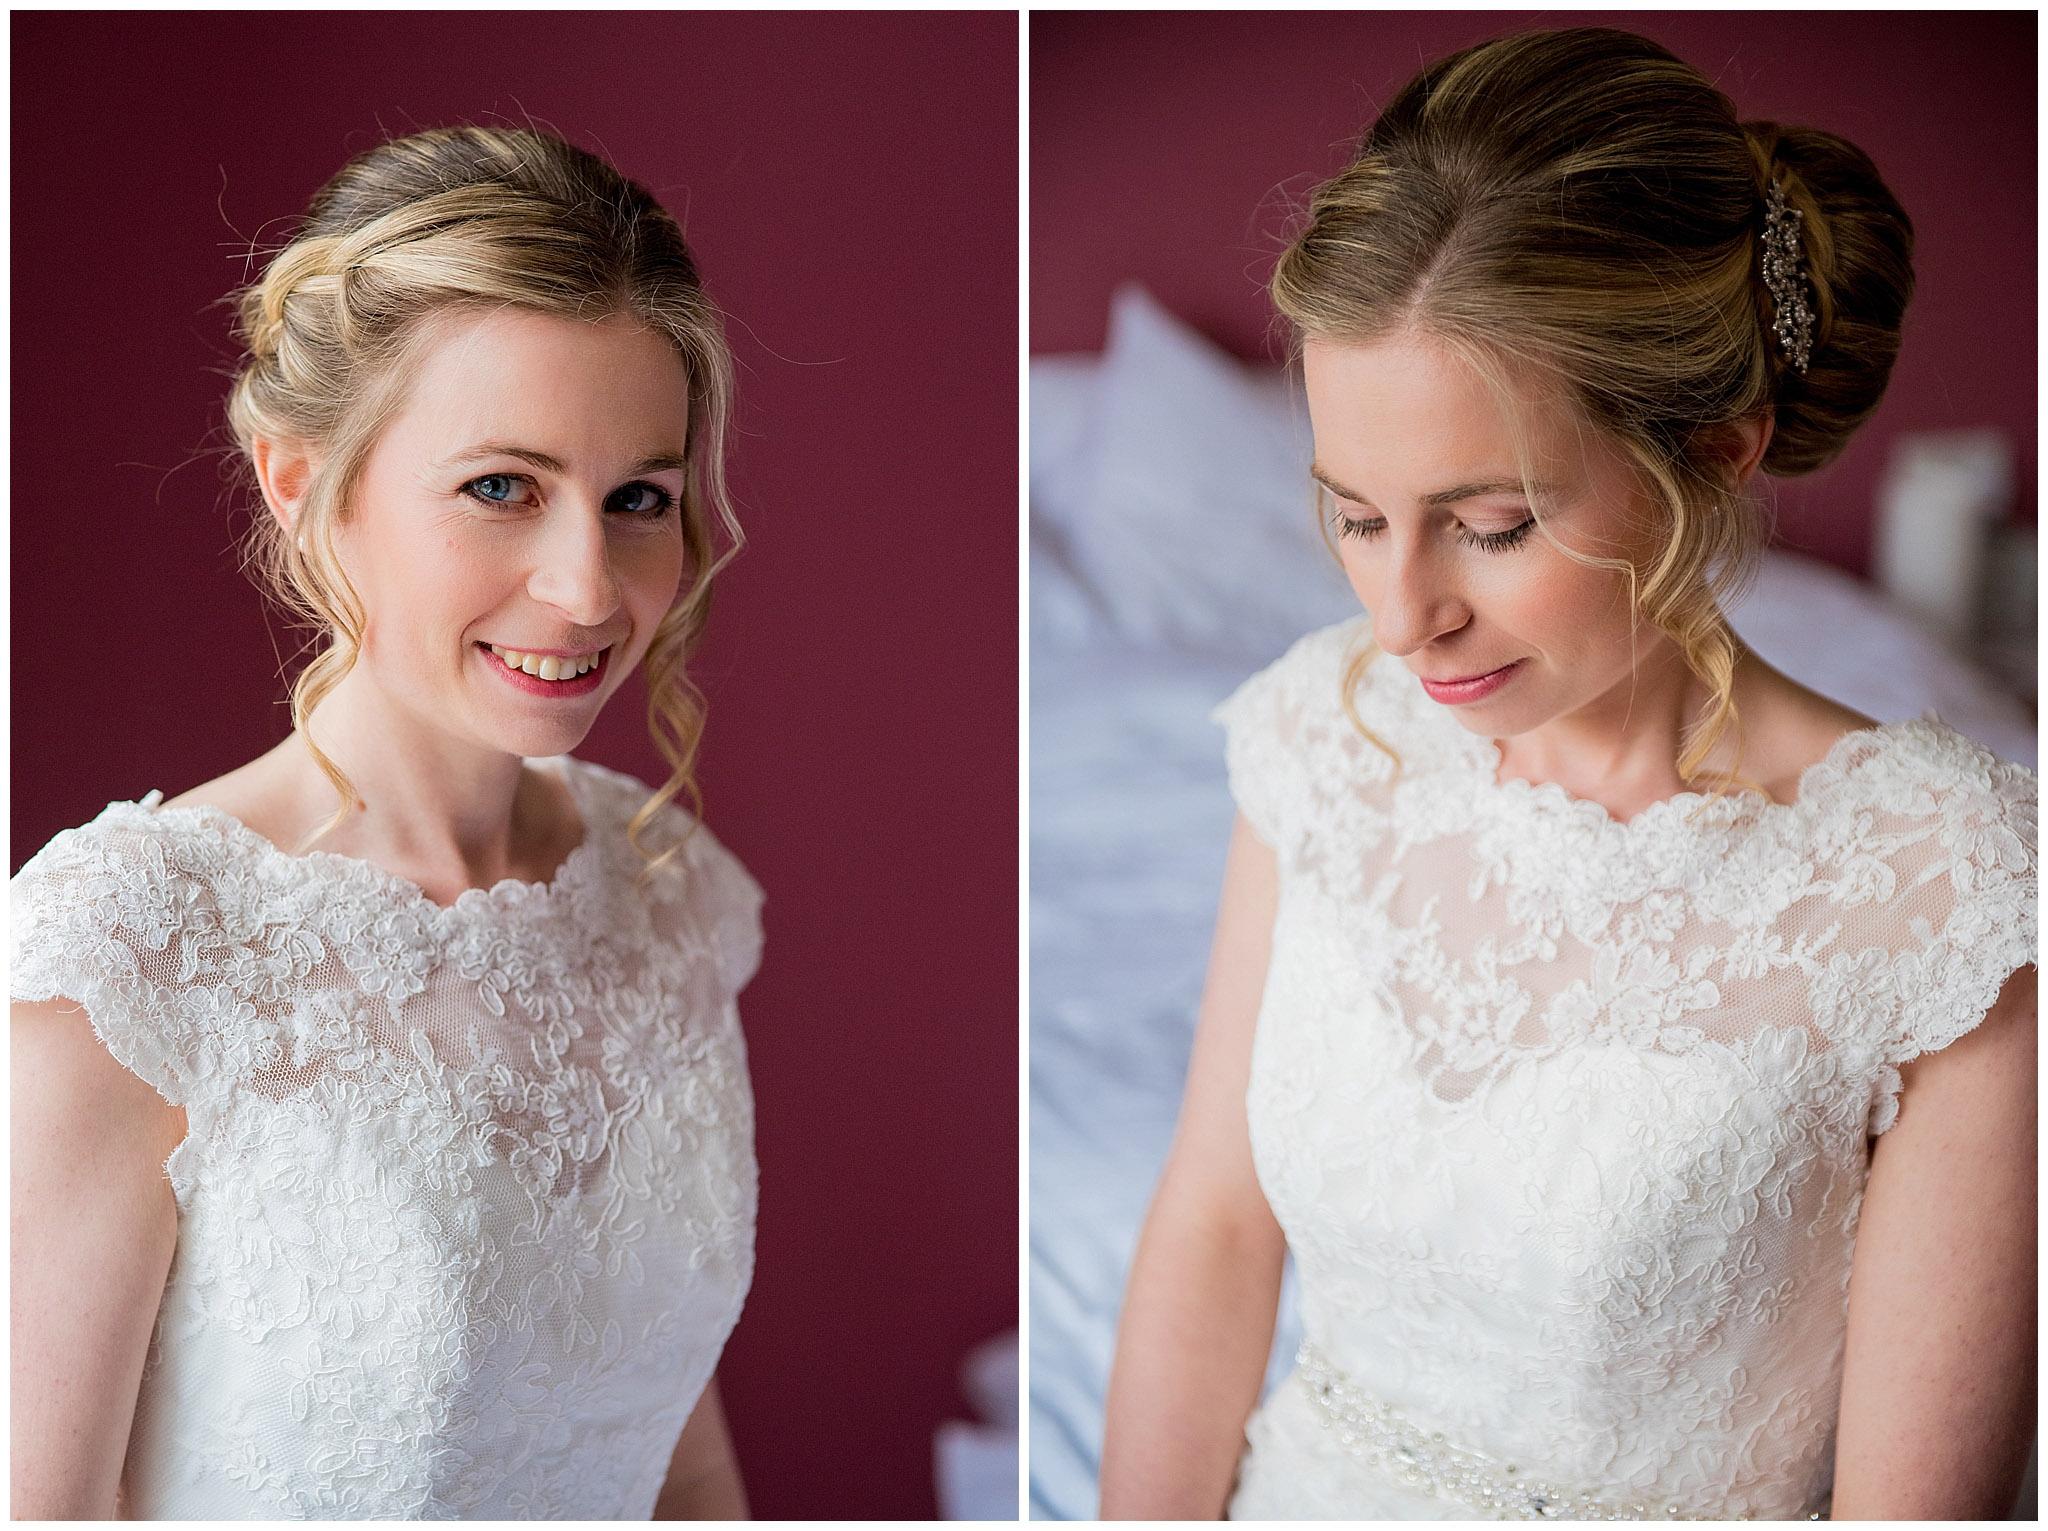 bride portrait in her wedding dress, bride smiling